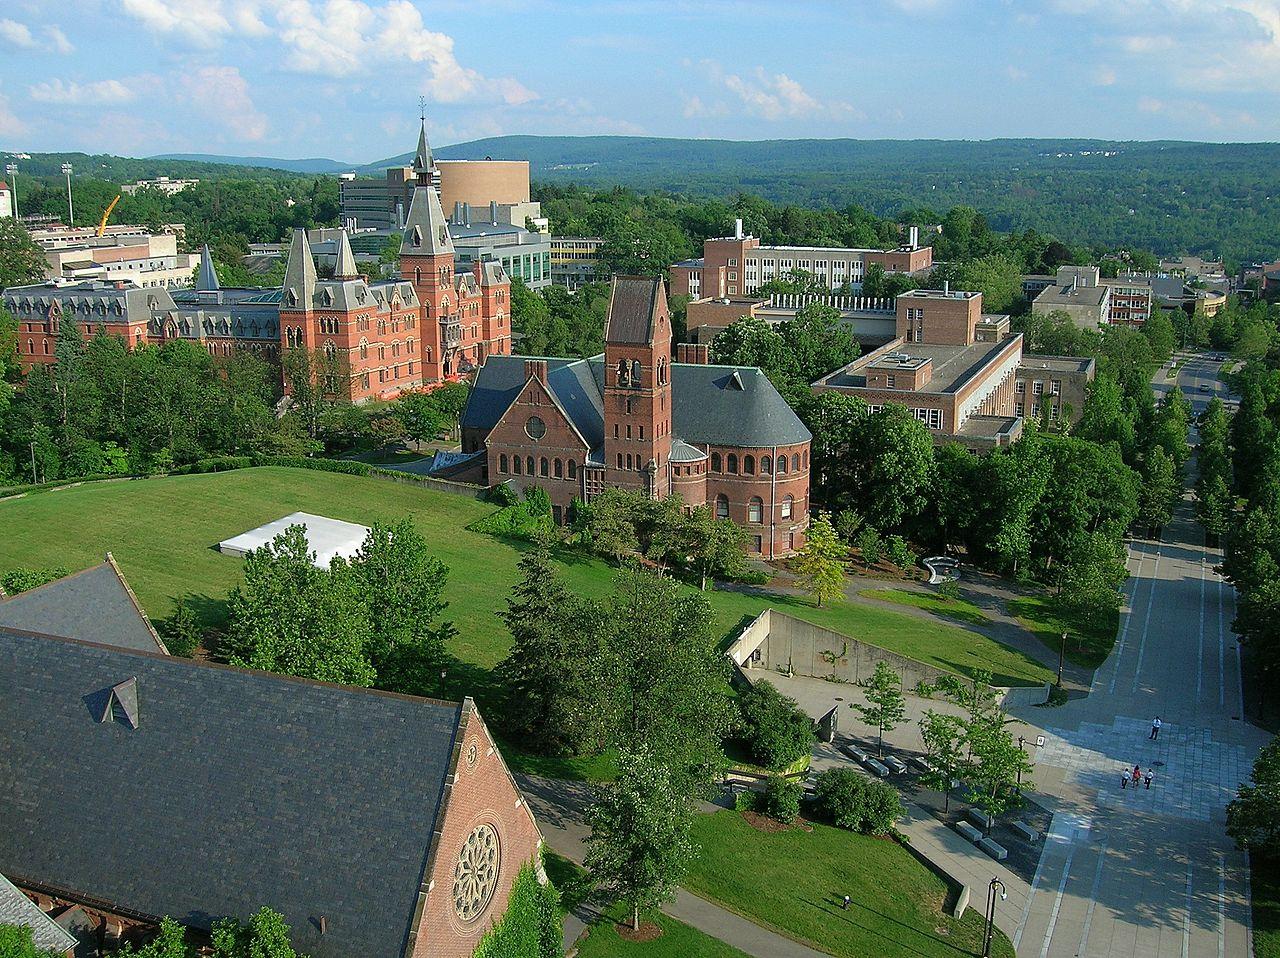 1280px-Cornell_University,_Ho_Plaza_and_Sage_Hall.jpg